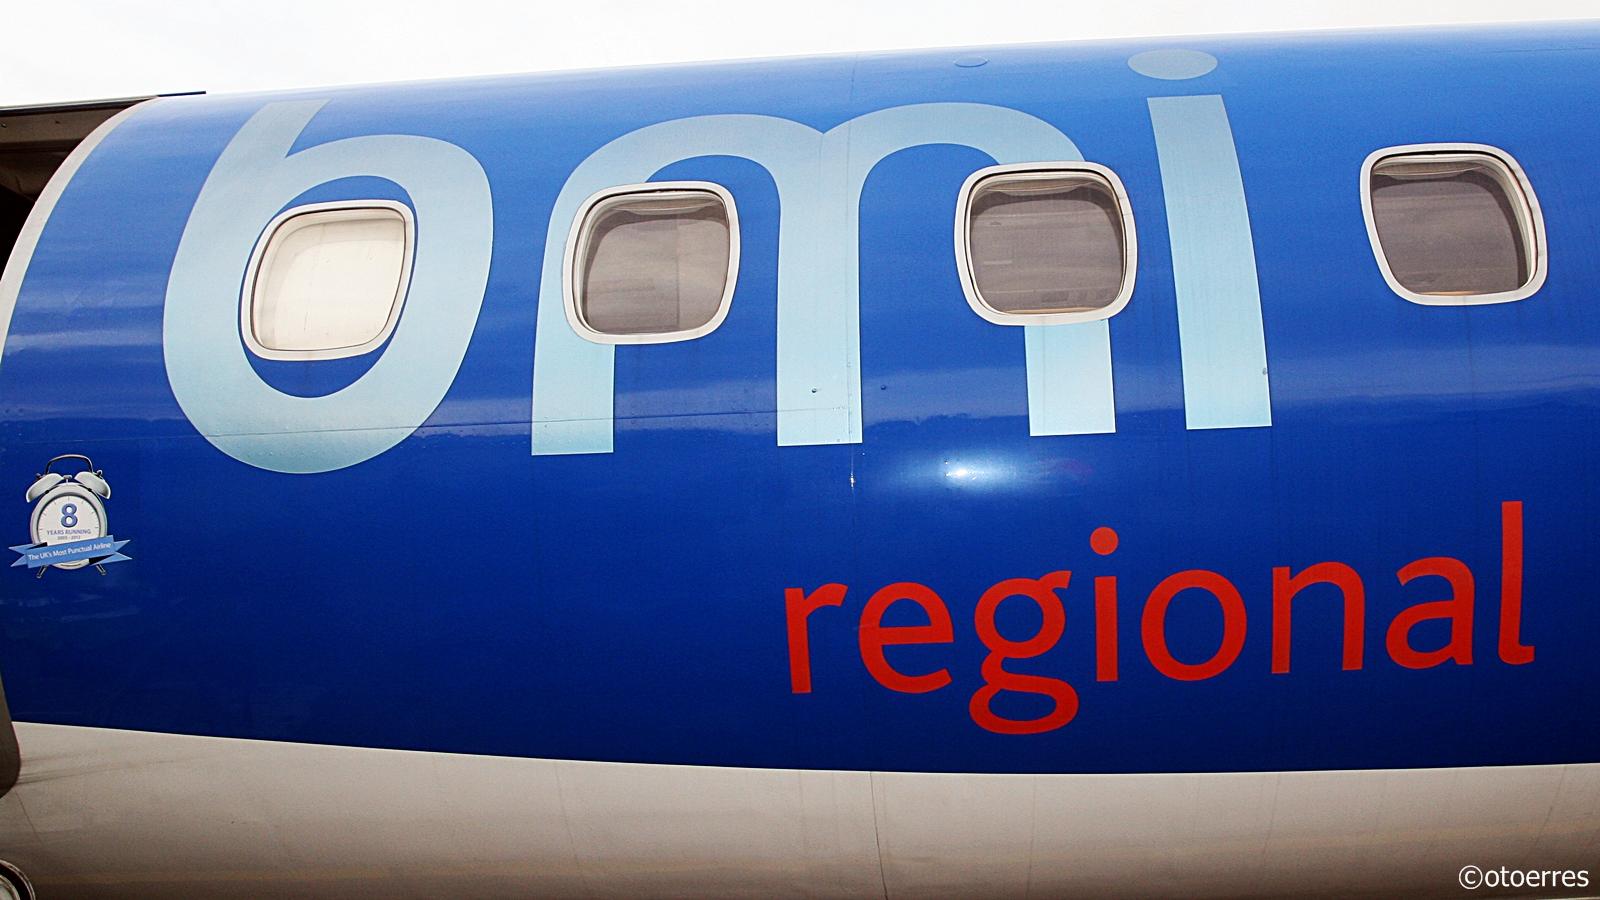 bmi regional - embraer RJ 145 - regionaljetfly